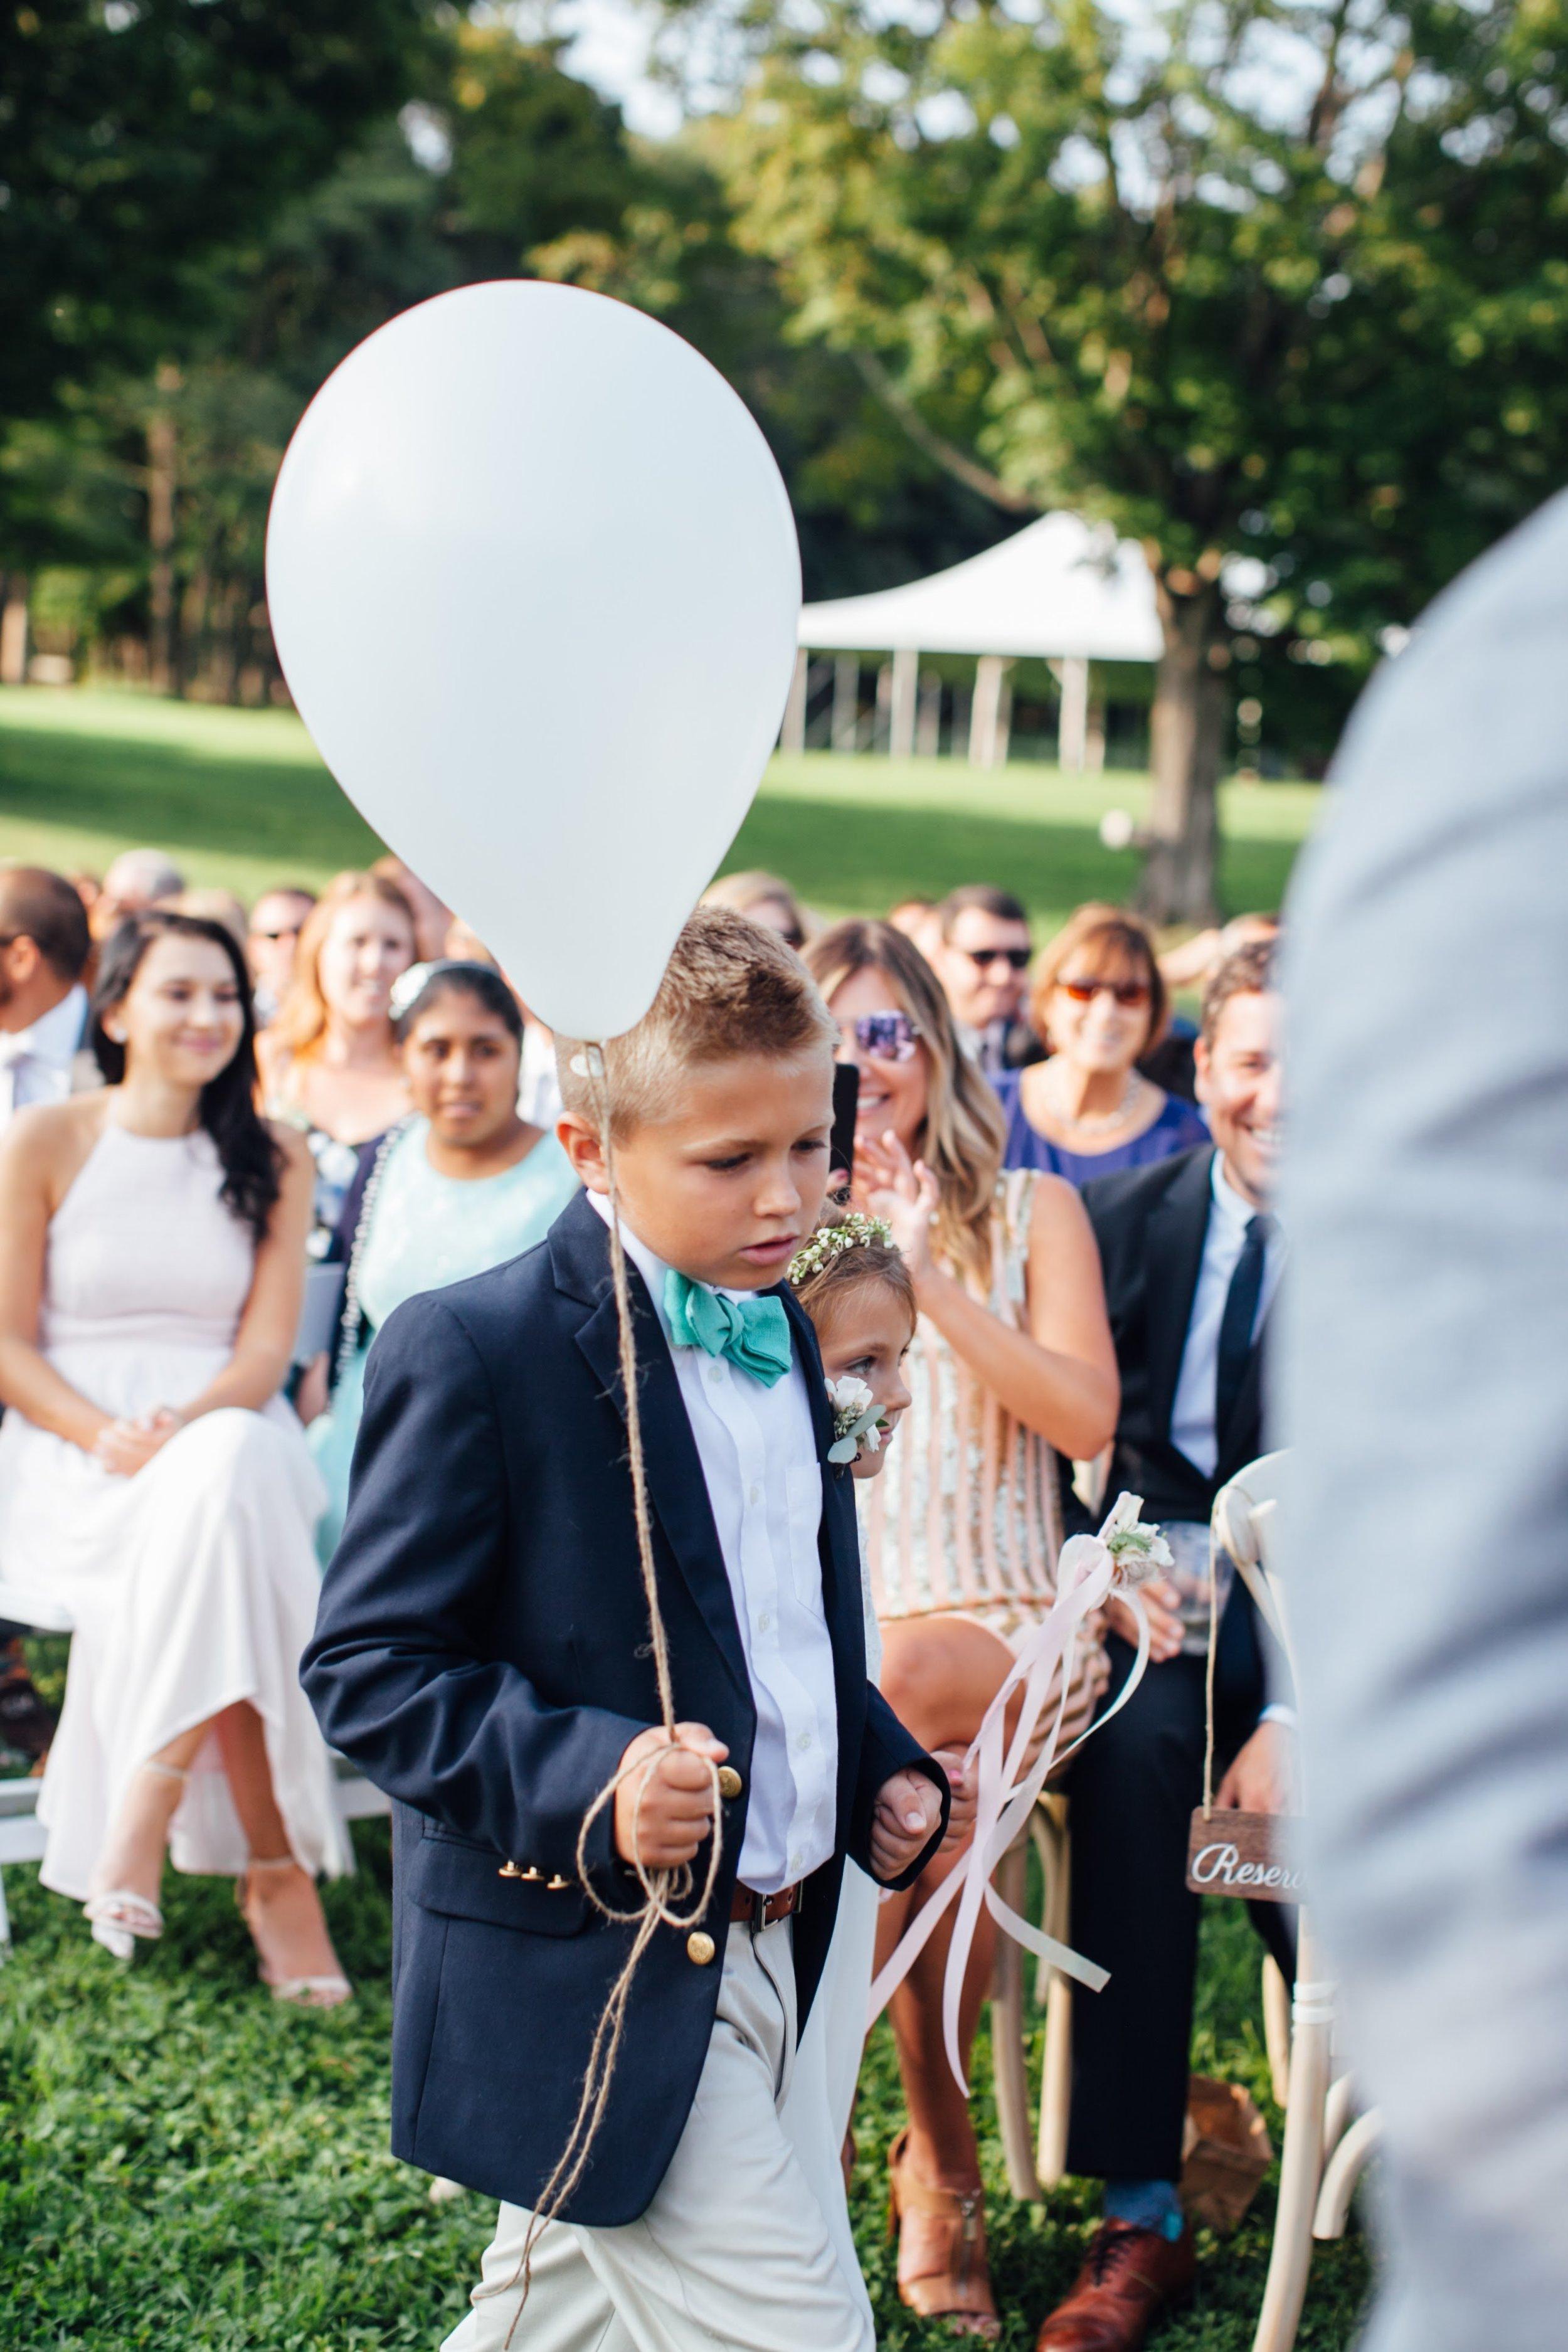 Courtney + Matt Blenheim Hill Farm Catskills NY Wedding Veronica Lola Photography 2017-358.jpg